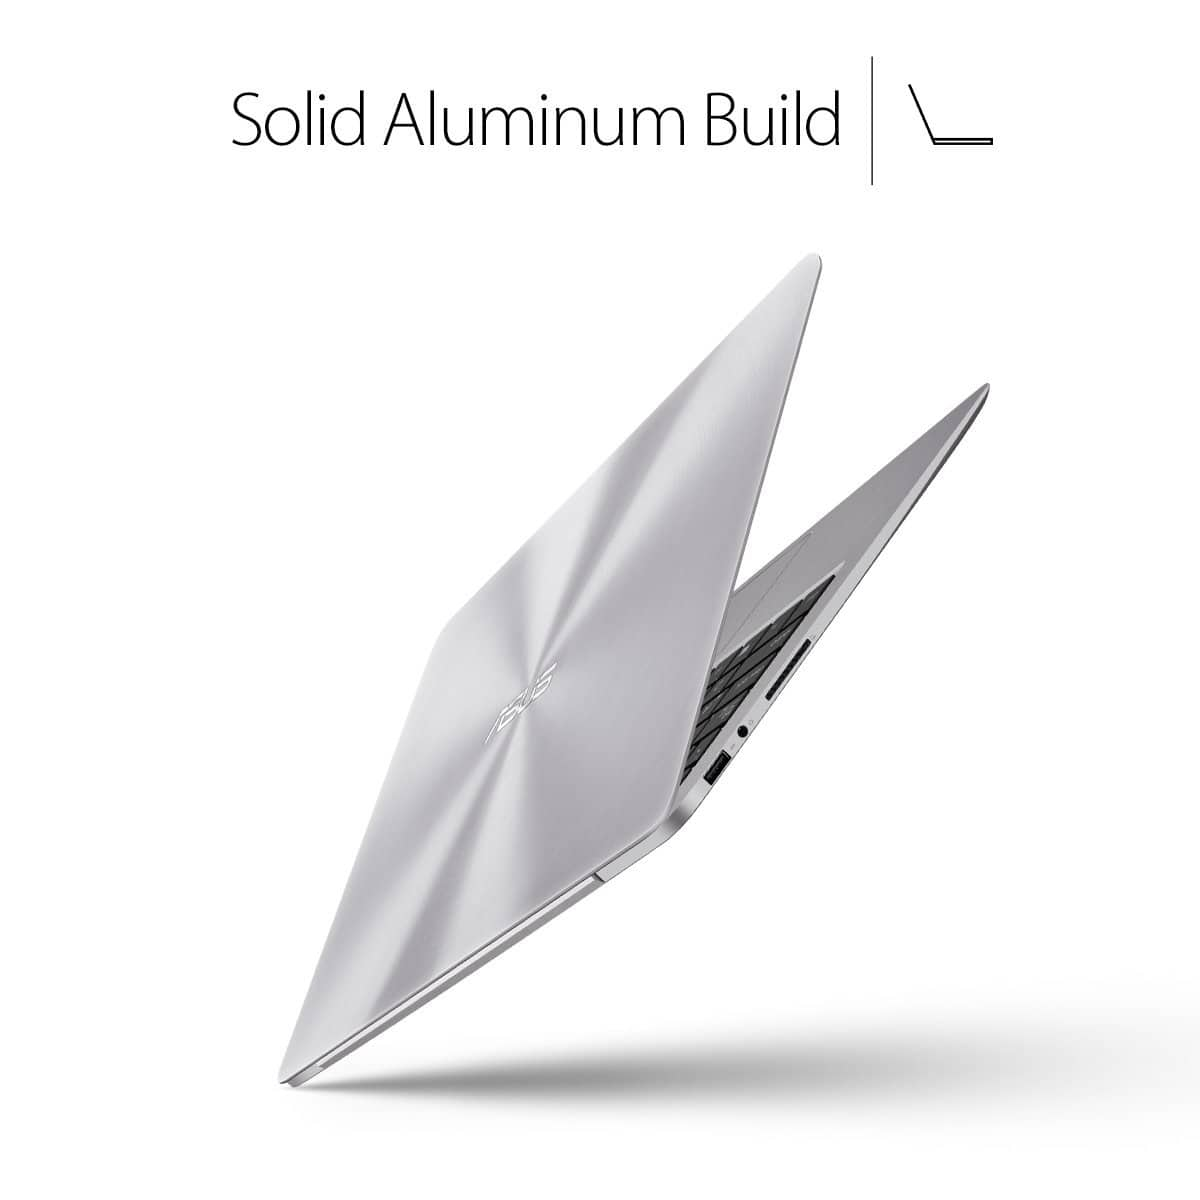 ASUS ZenBook UX330UA-AH54 13.3-inch LCD Ultra-Slim Laptop (Core i5 Processor, 8GB DDR3, 256GB SSD, Windows 10) w/ Harman Kardon Audio, Backlit keyboard, 2.6 Pounds only! $699